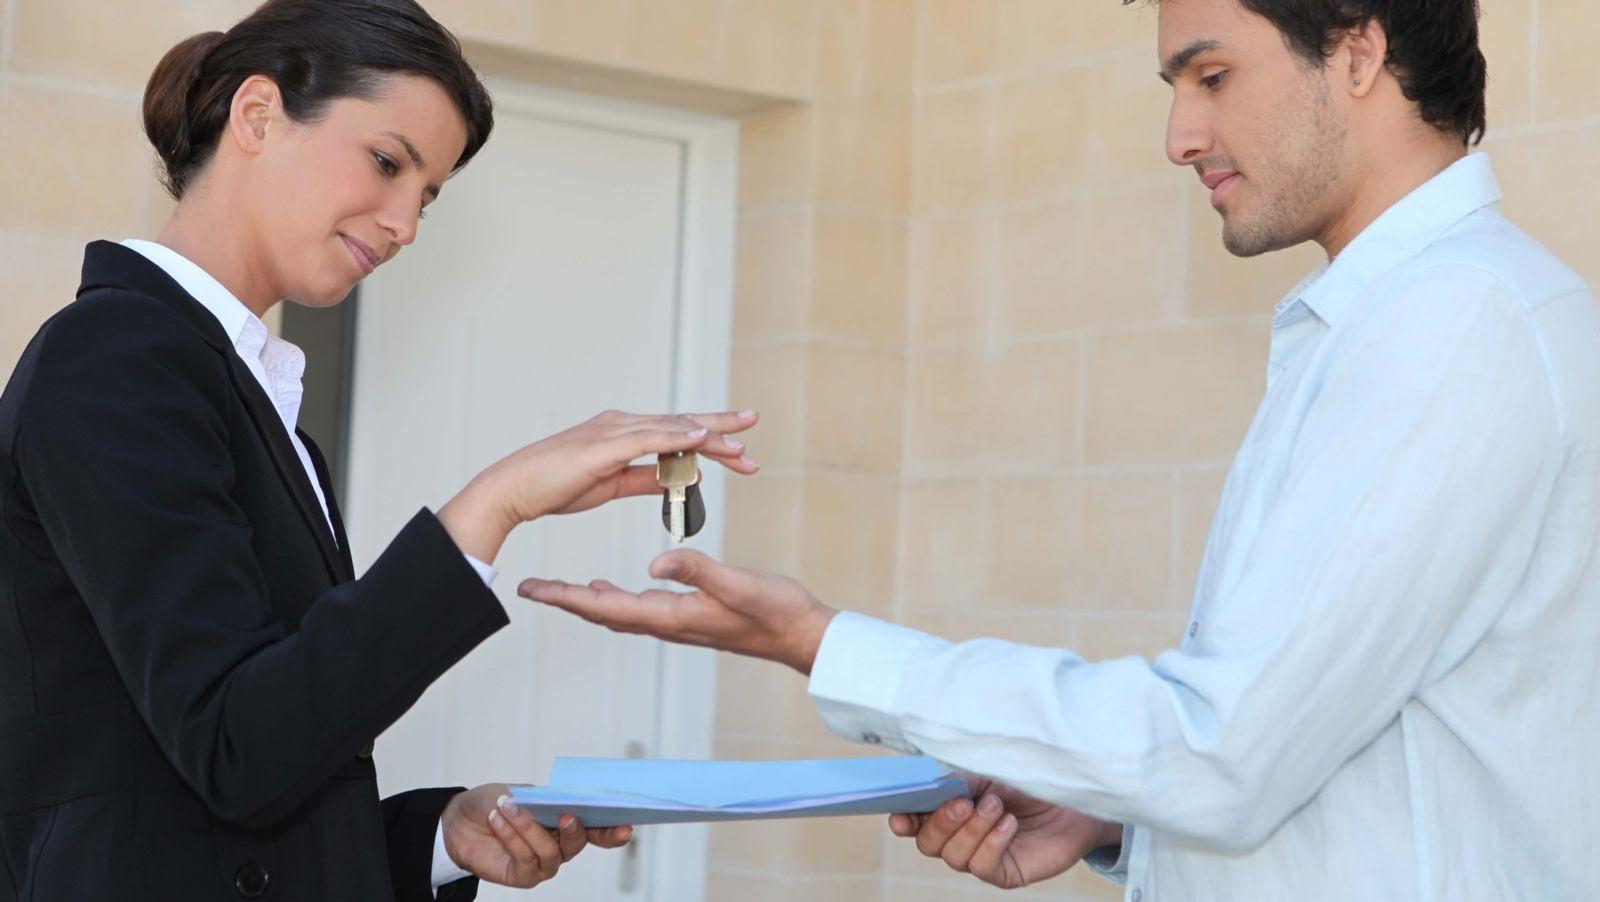 Woman (landlord) handing keys to a man (tenant)